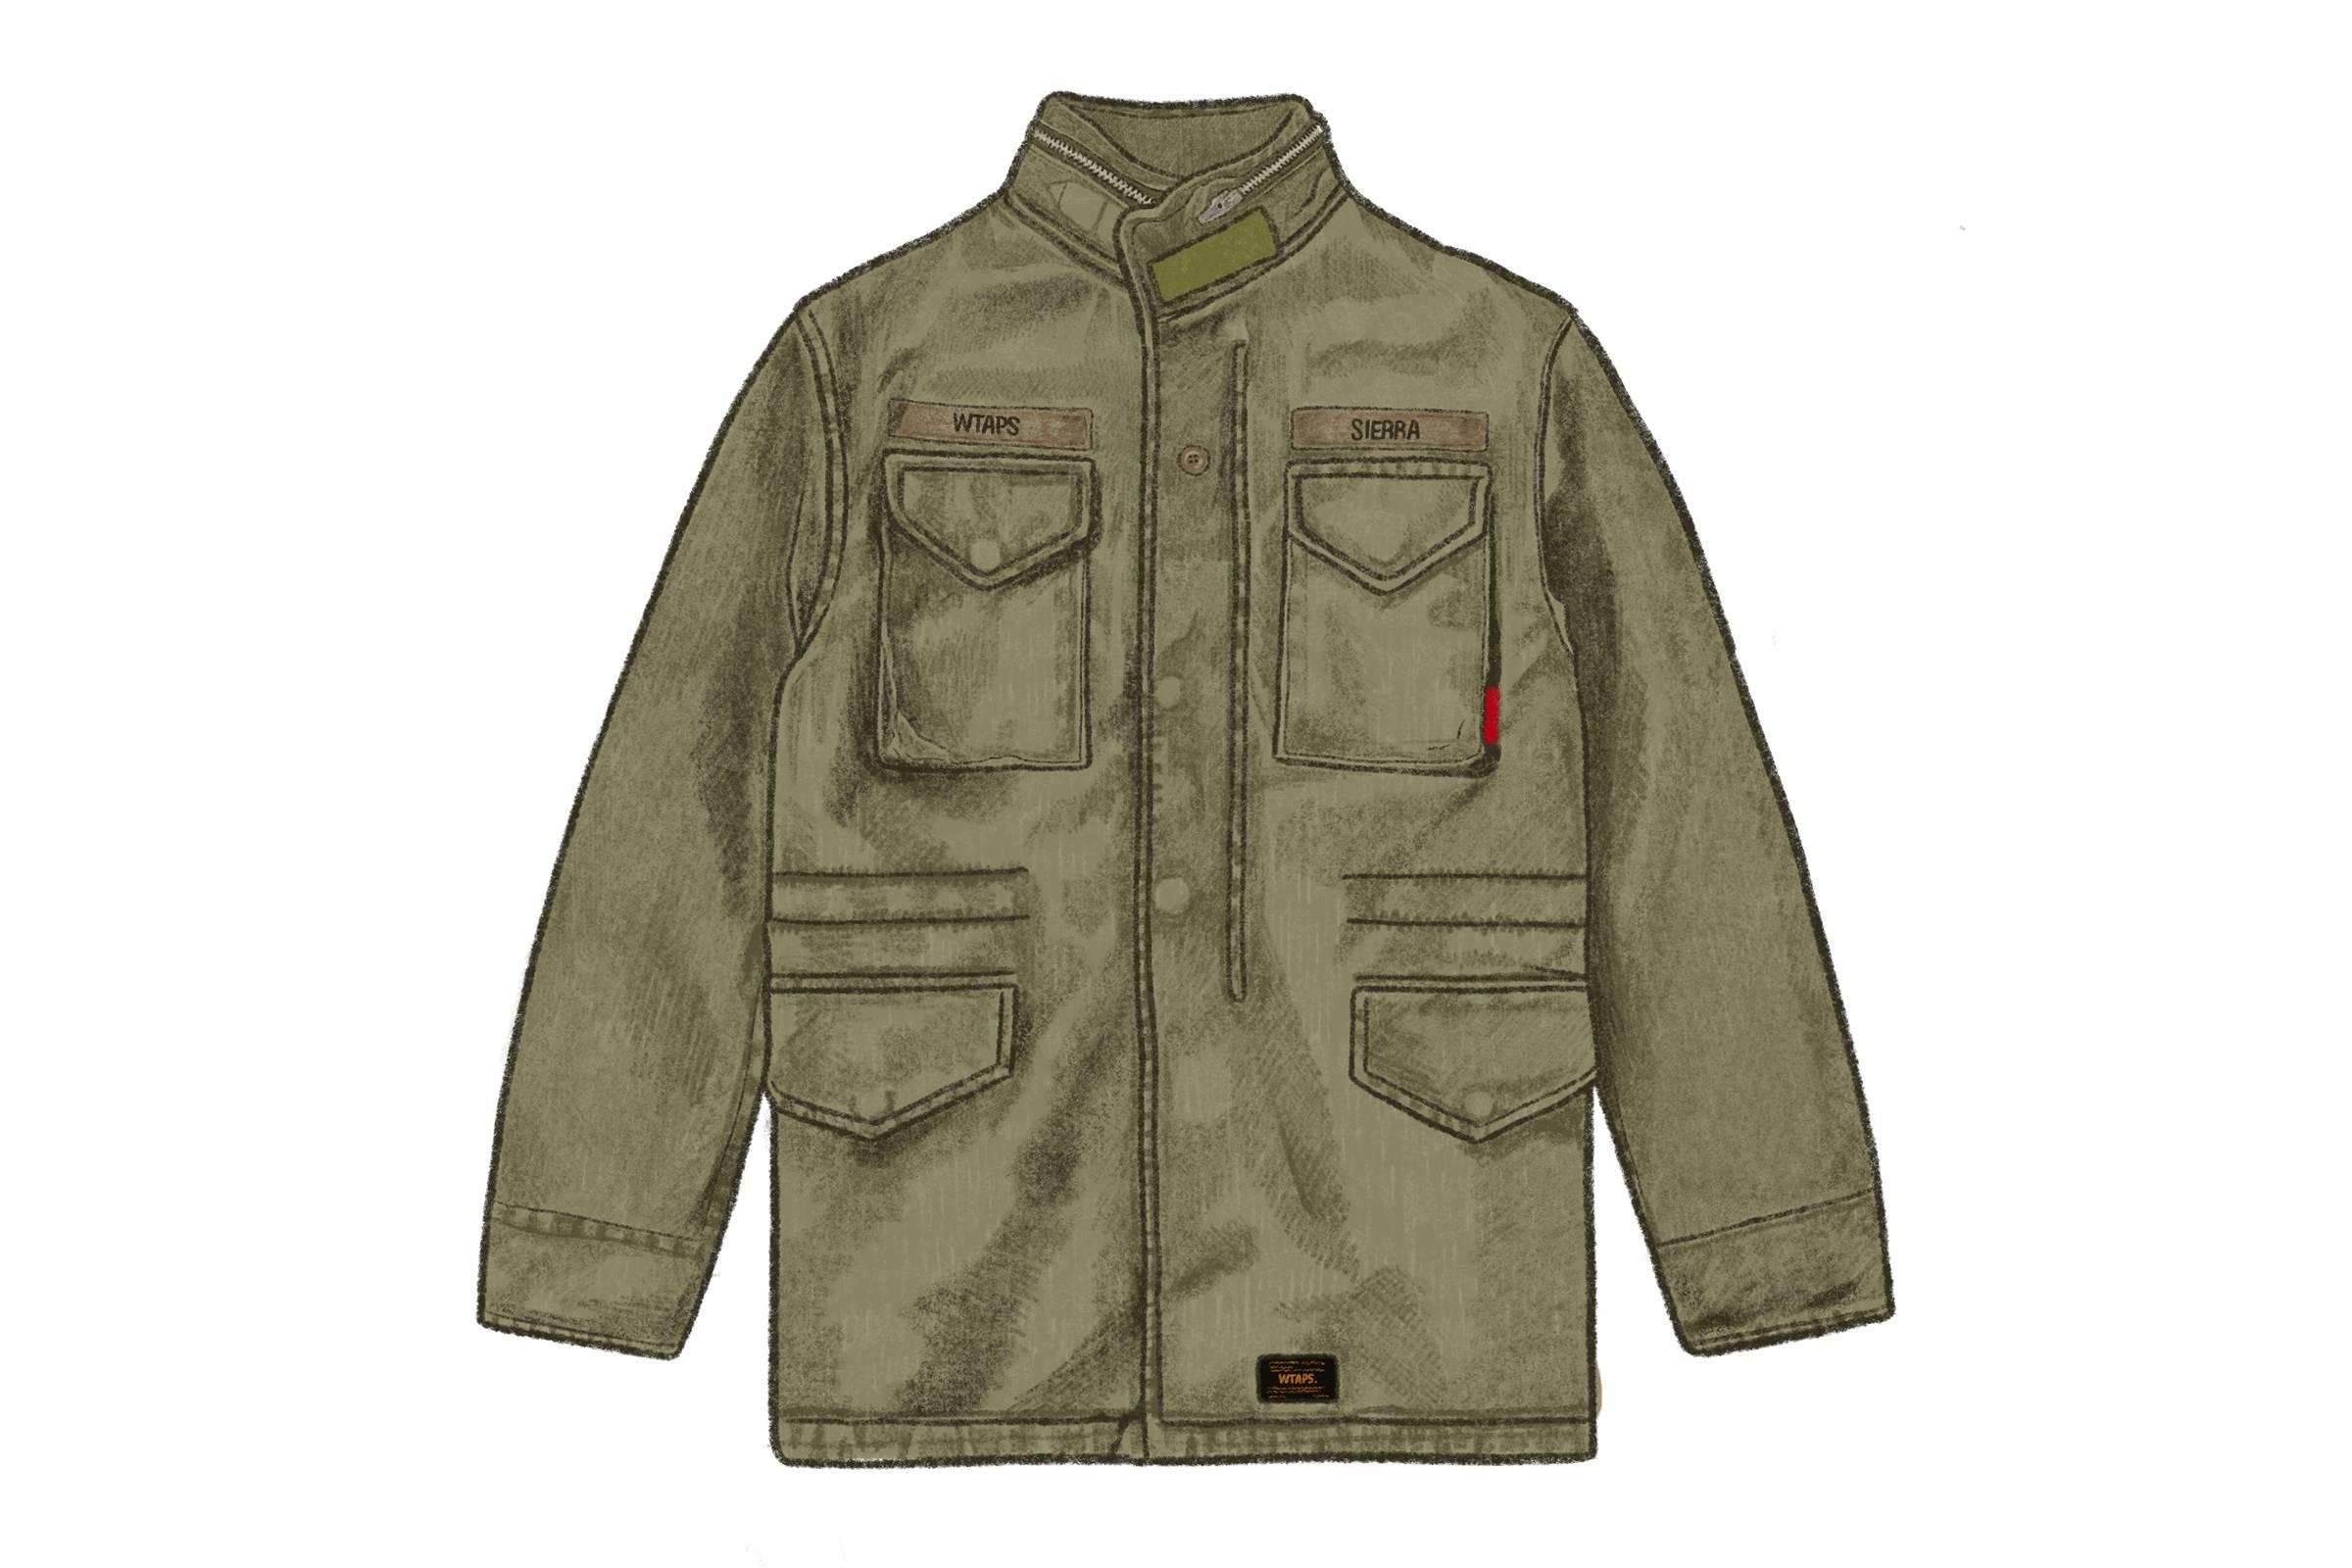 M-65 Military Jacket